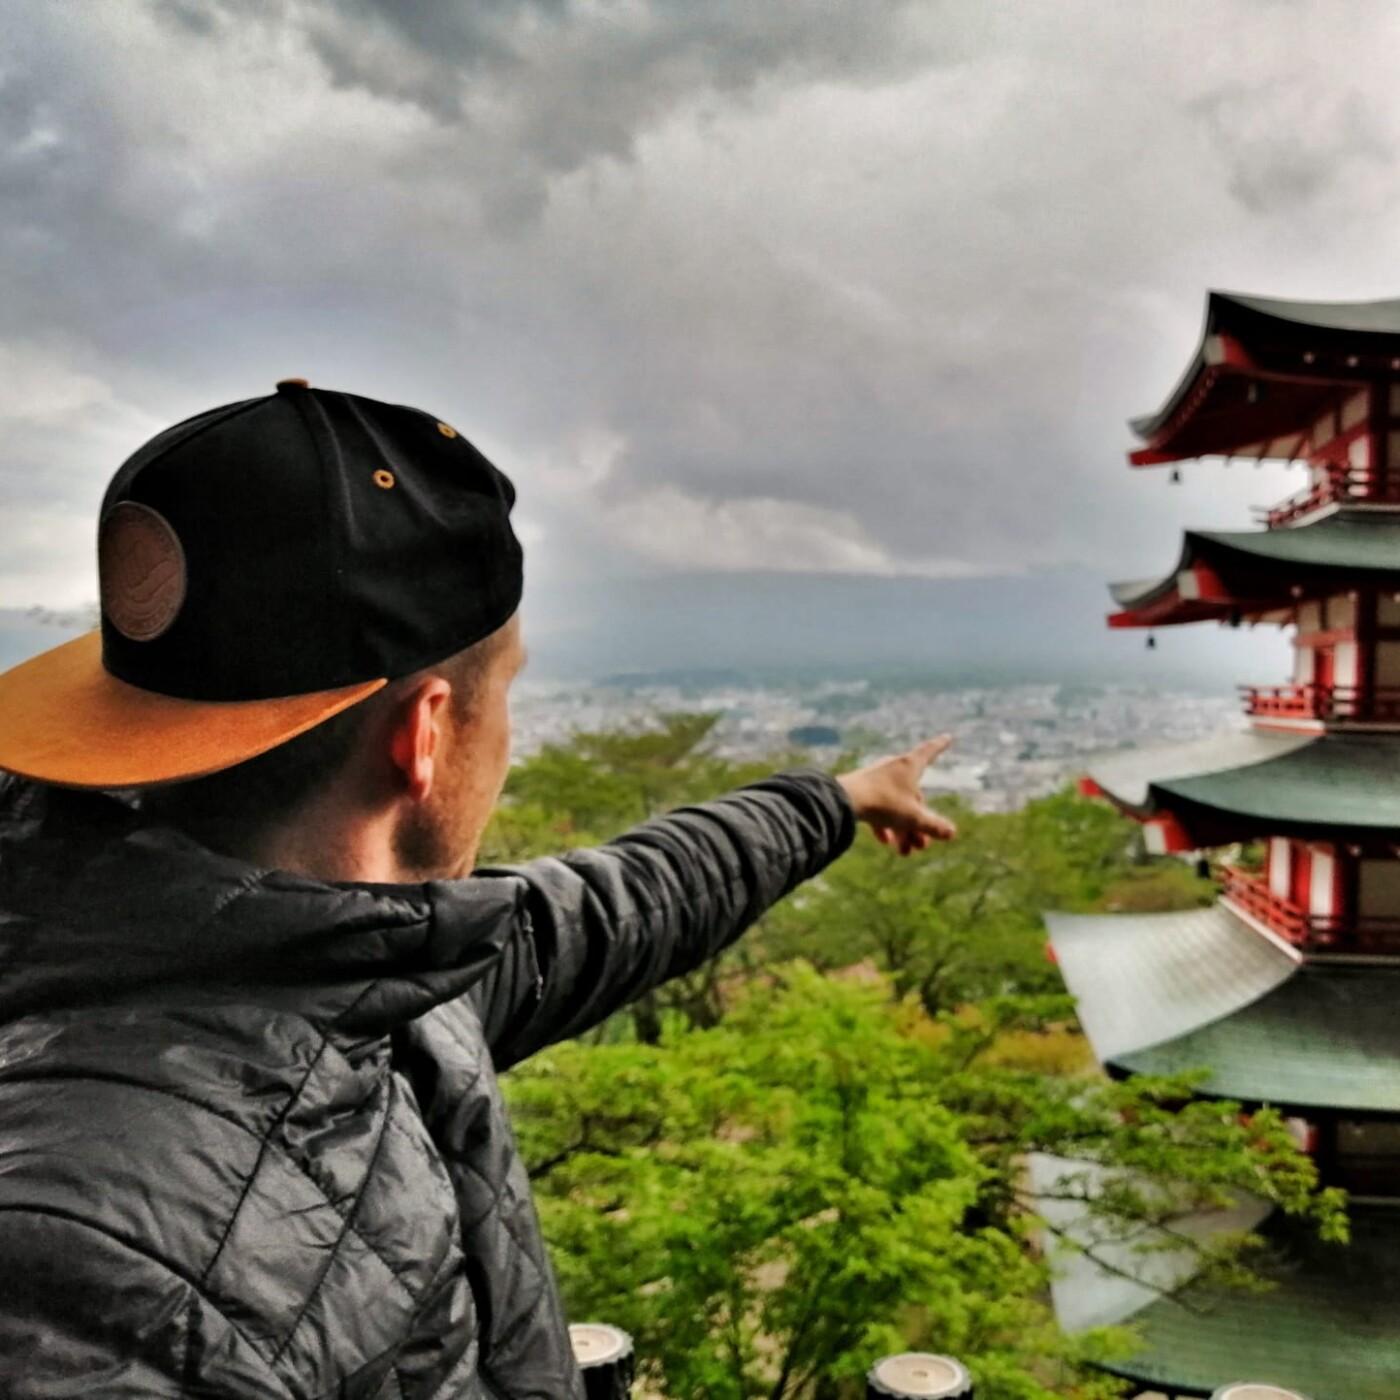 GreenWoodAntony raconte son voyage en Thaïlande - Globe Trotter 12 02 - Mars 2021 - StereoChic Radio